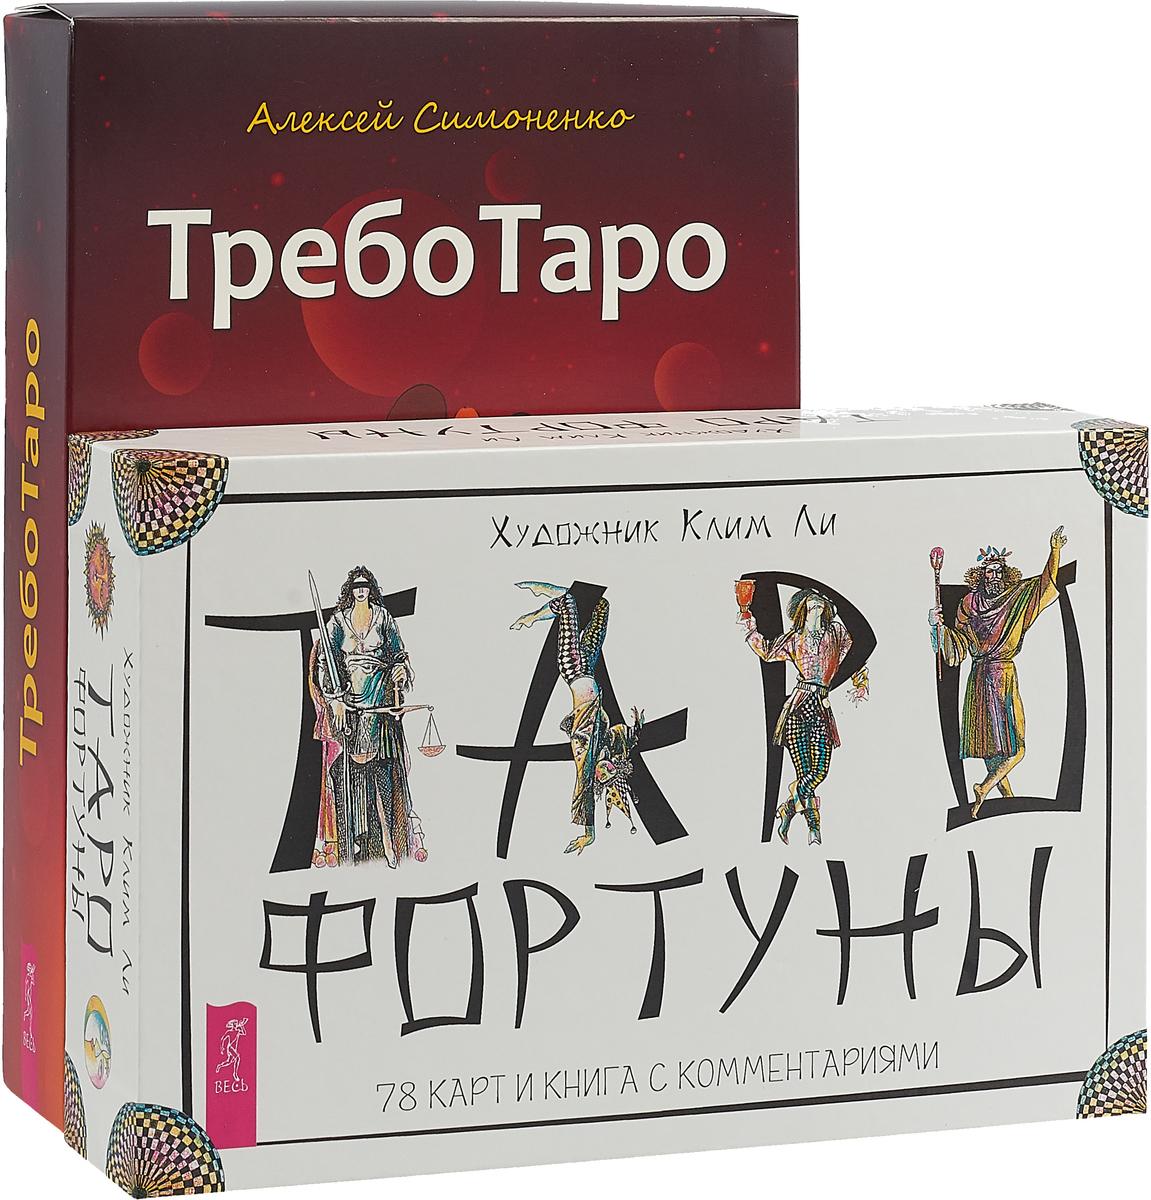 Таро Фортуны. ТребоТаро (комплект из 2 книг)